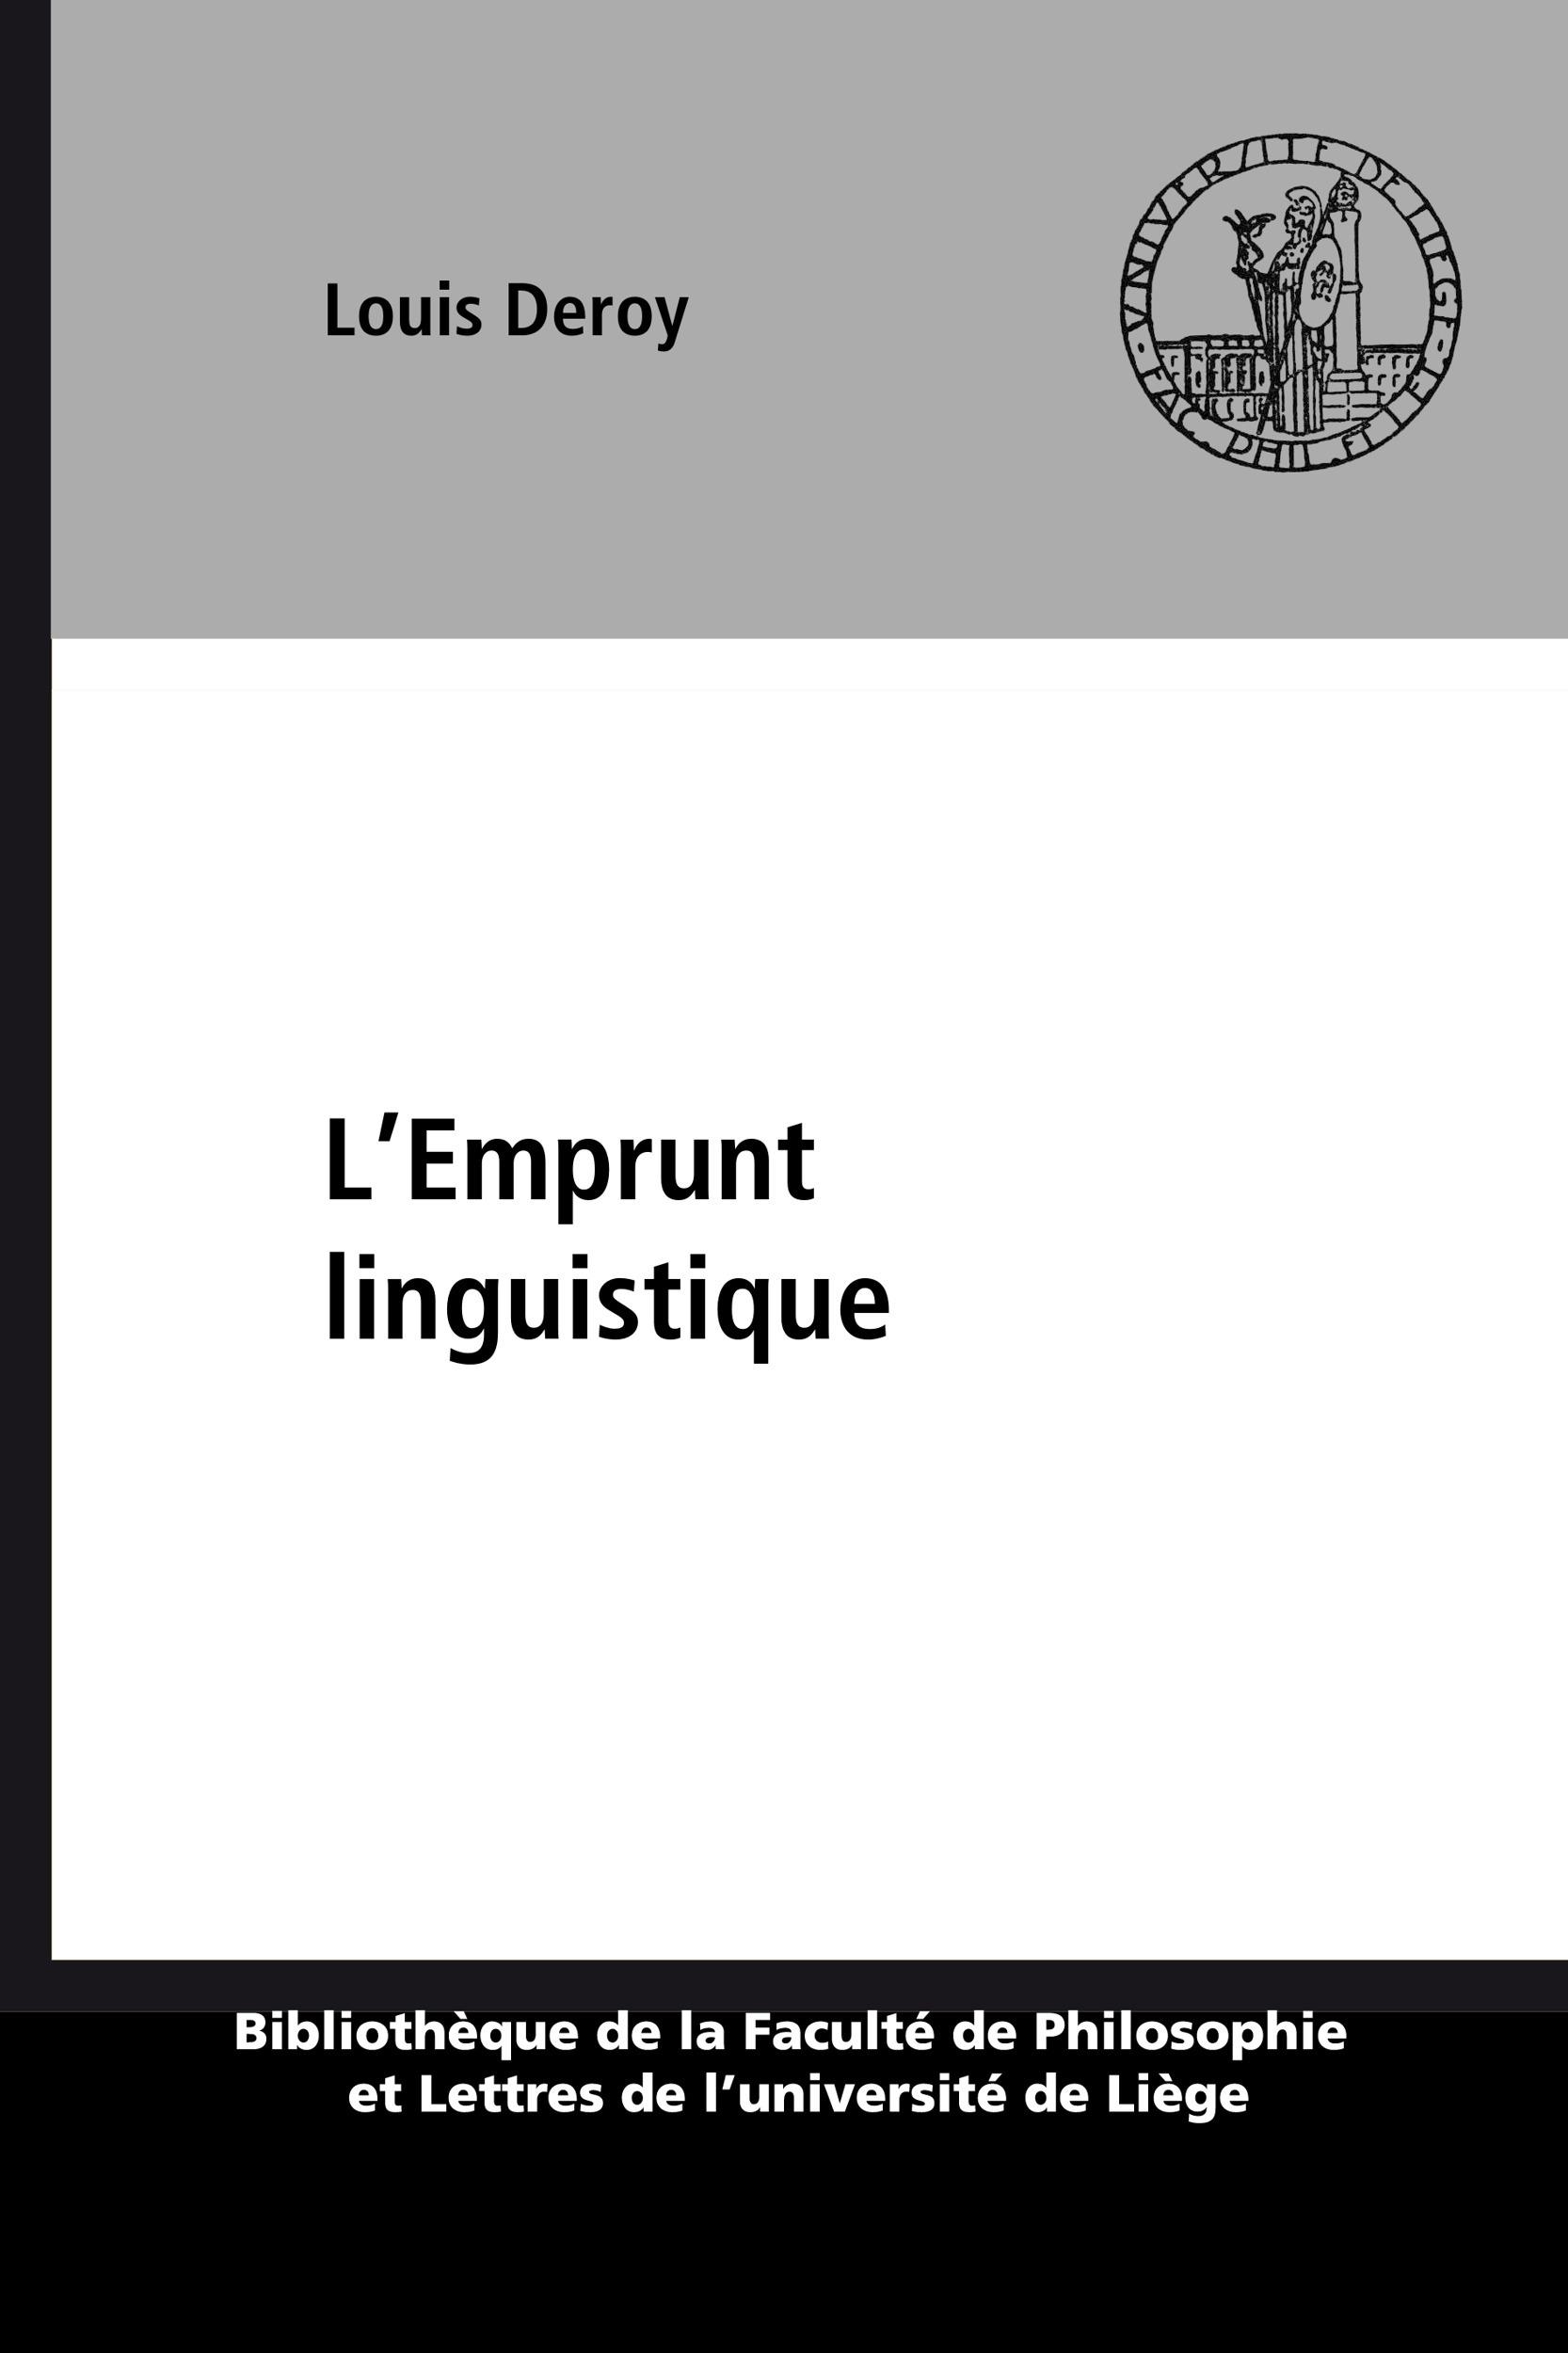 L'Emprunt linguistique